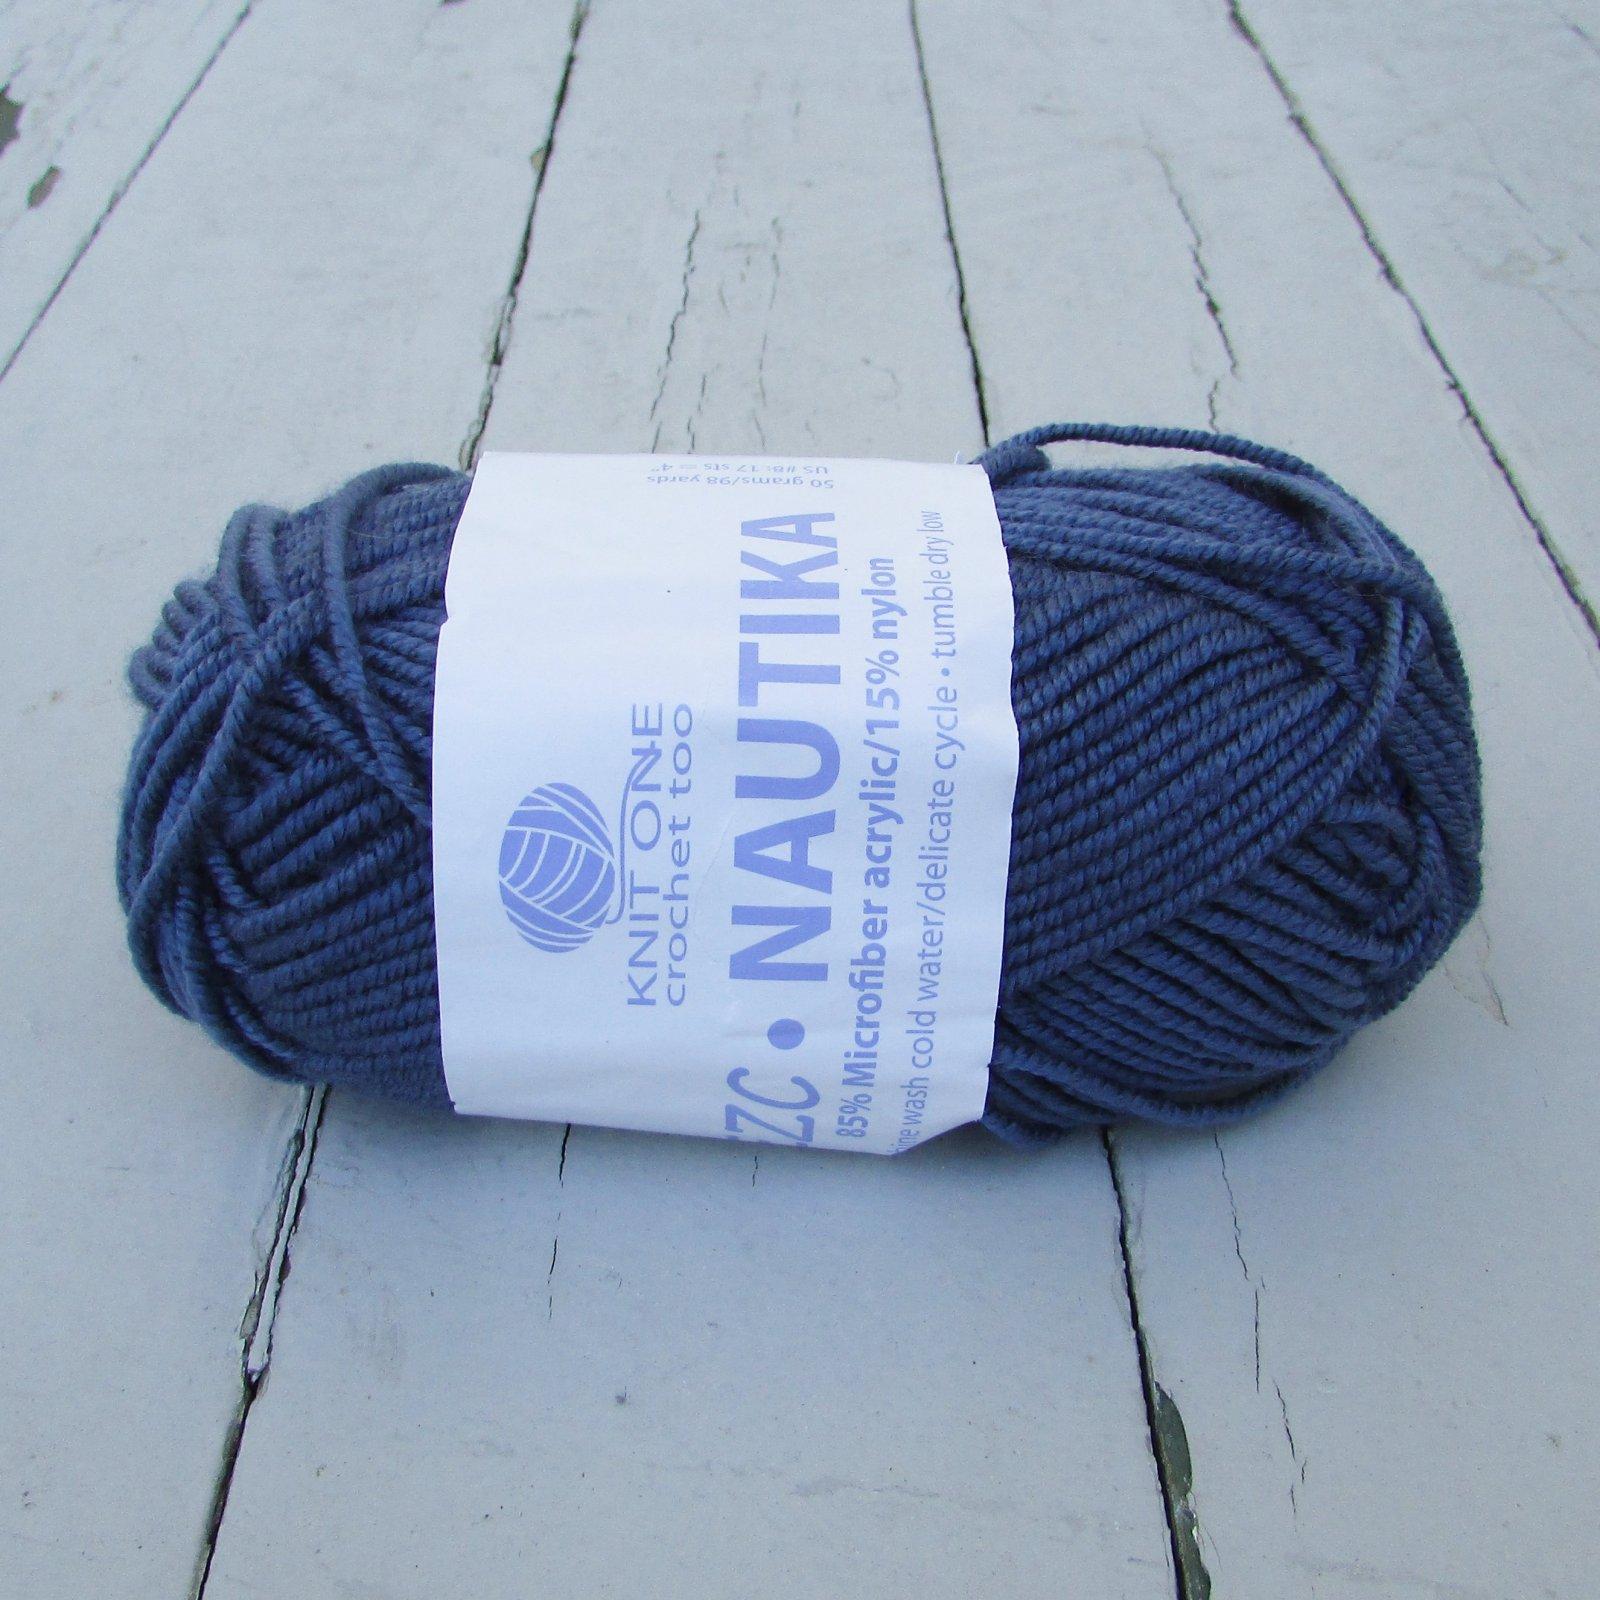 Knit One Crochet Too Nautika